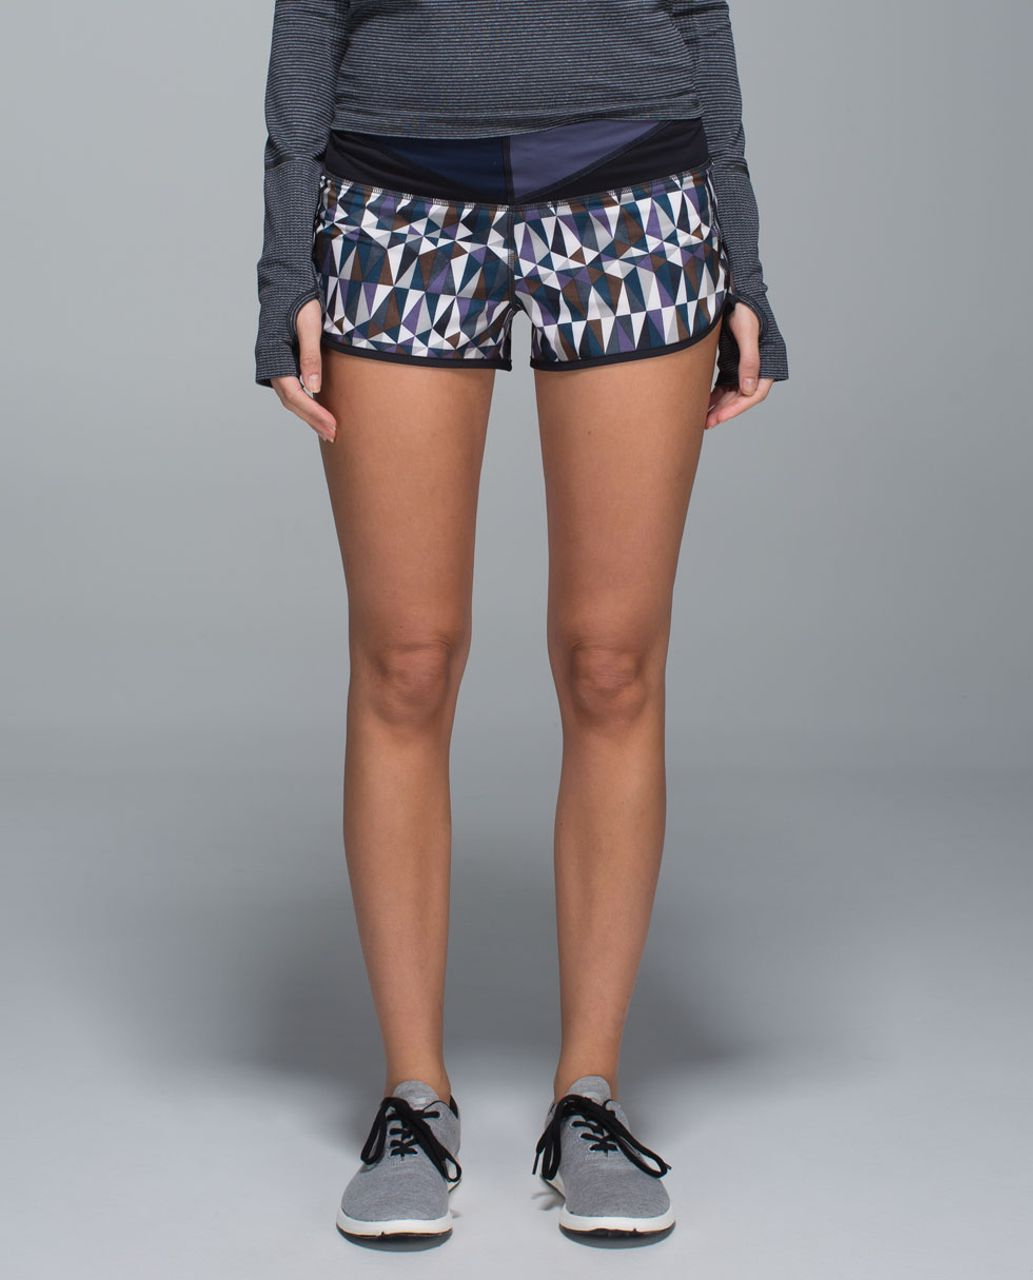 Lululemon Run:  Speed Short *4-way Stretch - Stained Glass Love Neutral Blush Black / Black / WI14 Quilt 25